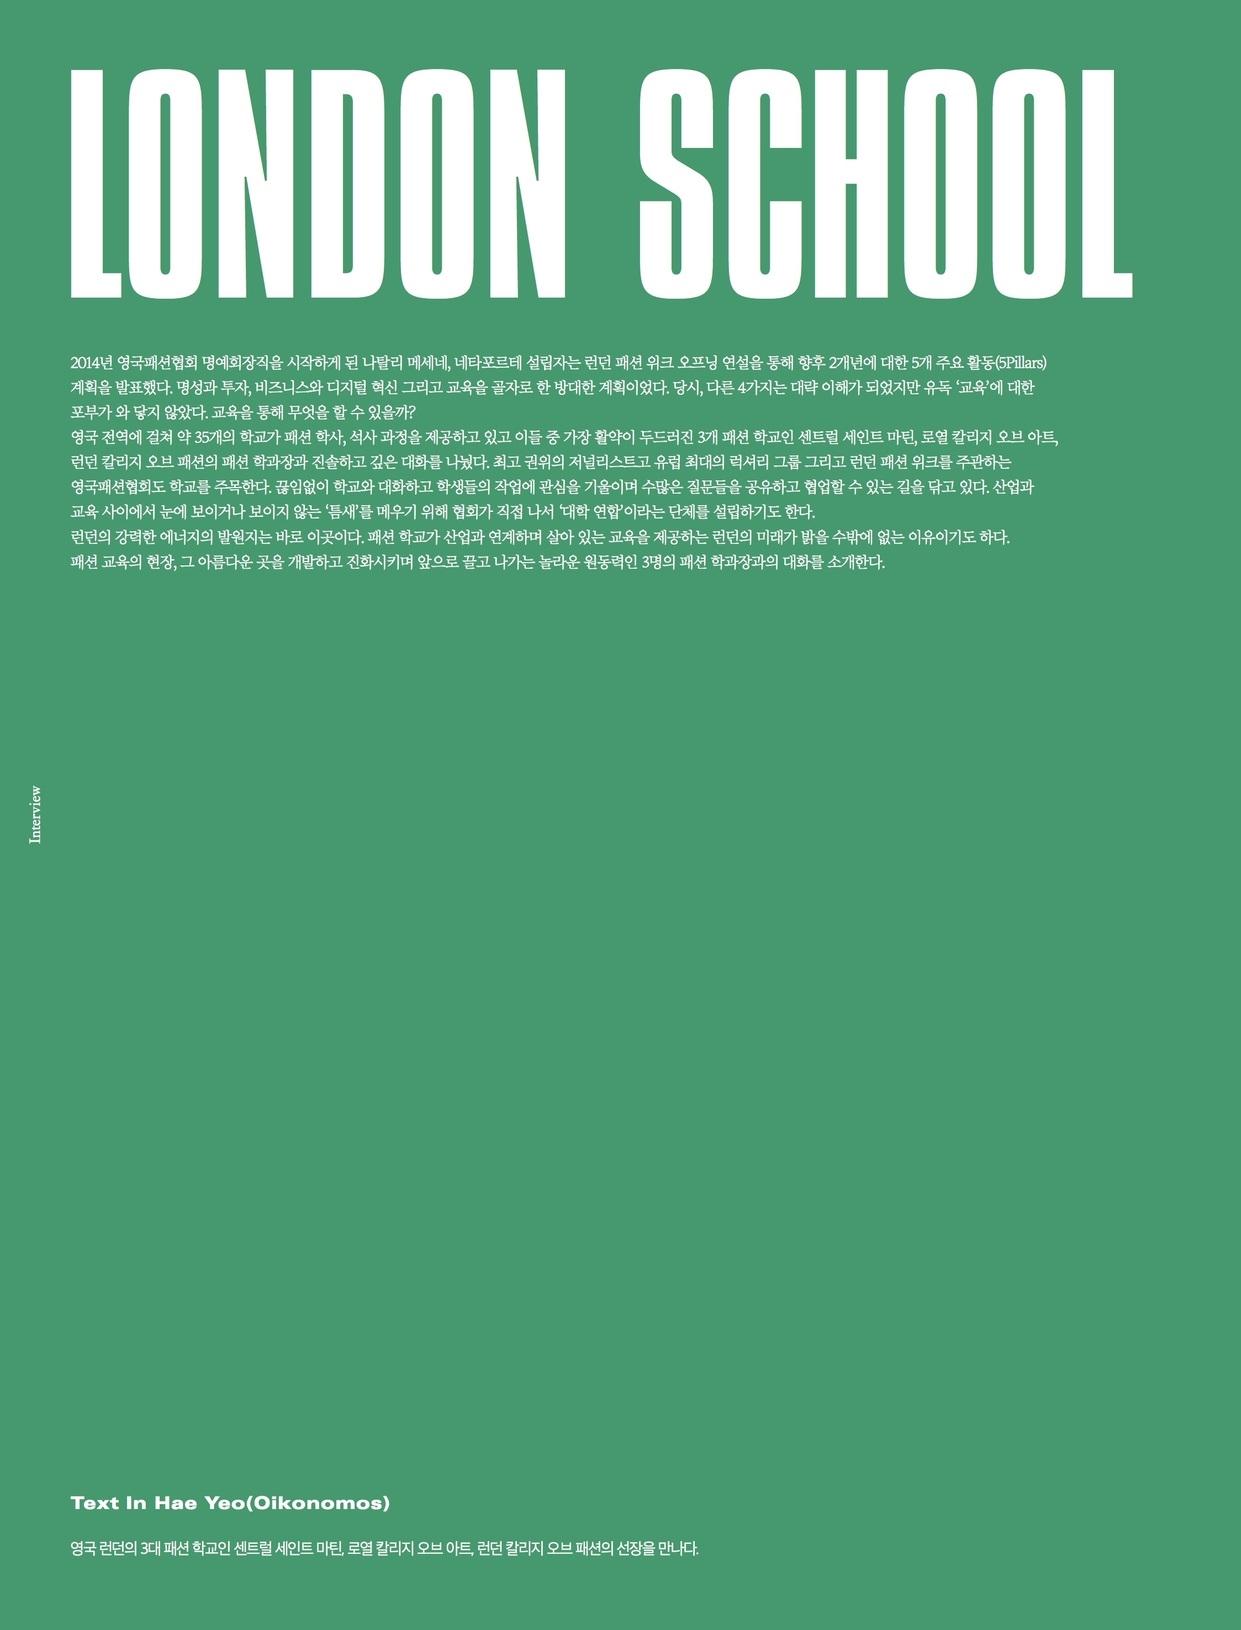 London School_1.jpg